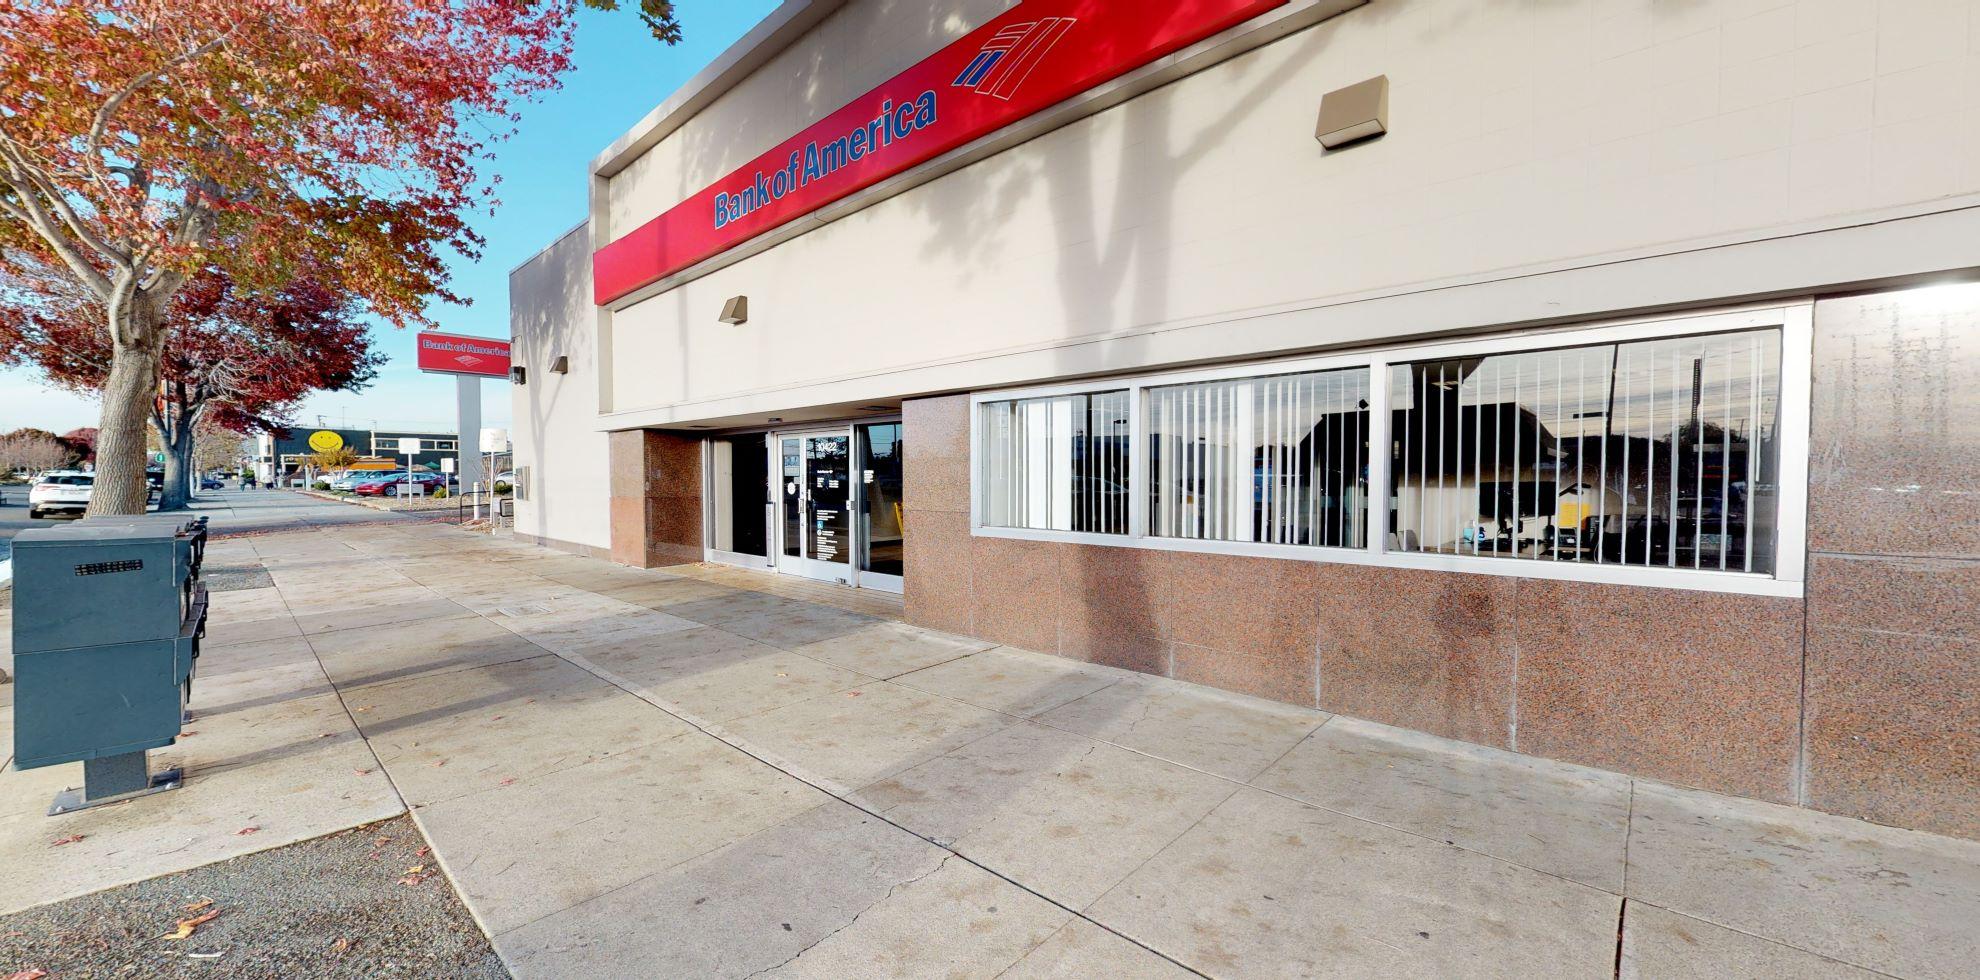 Bank of America financial center with walk-up ATM   10422 San Pablo Ave, El Cerrito, CA 94530